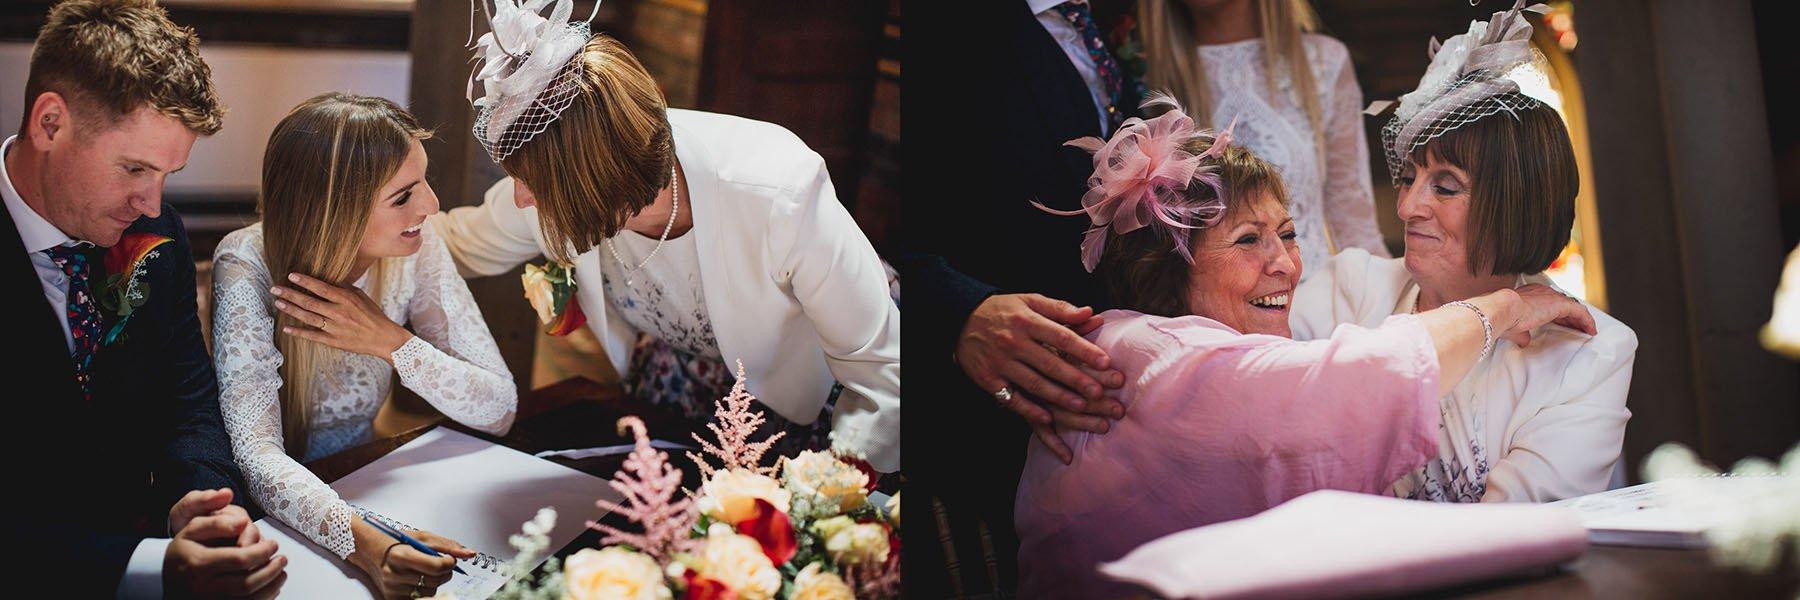 eastbourne-wedding-photography-hannah-tom-030